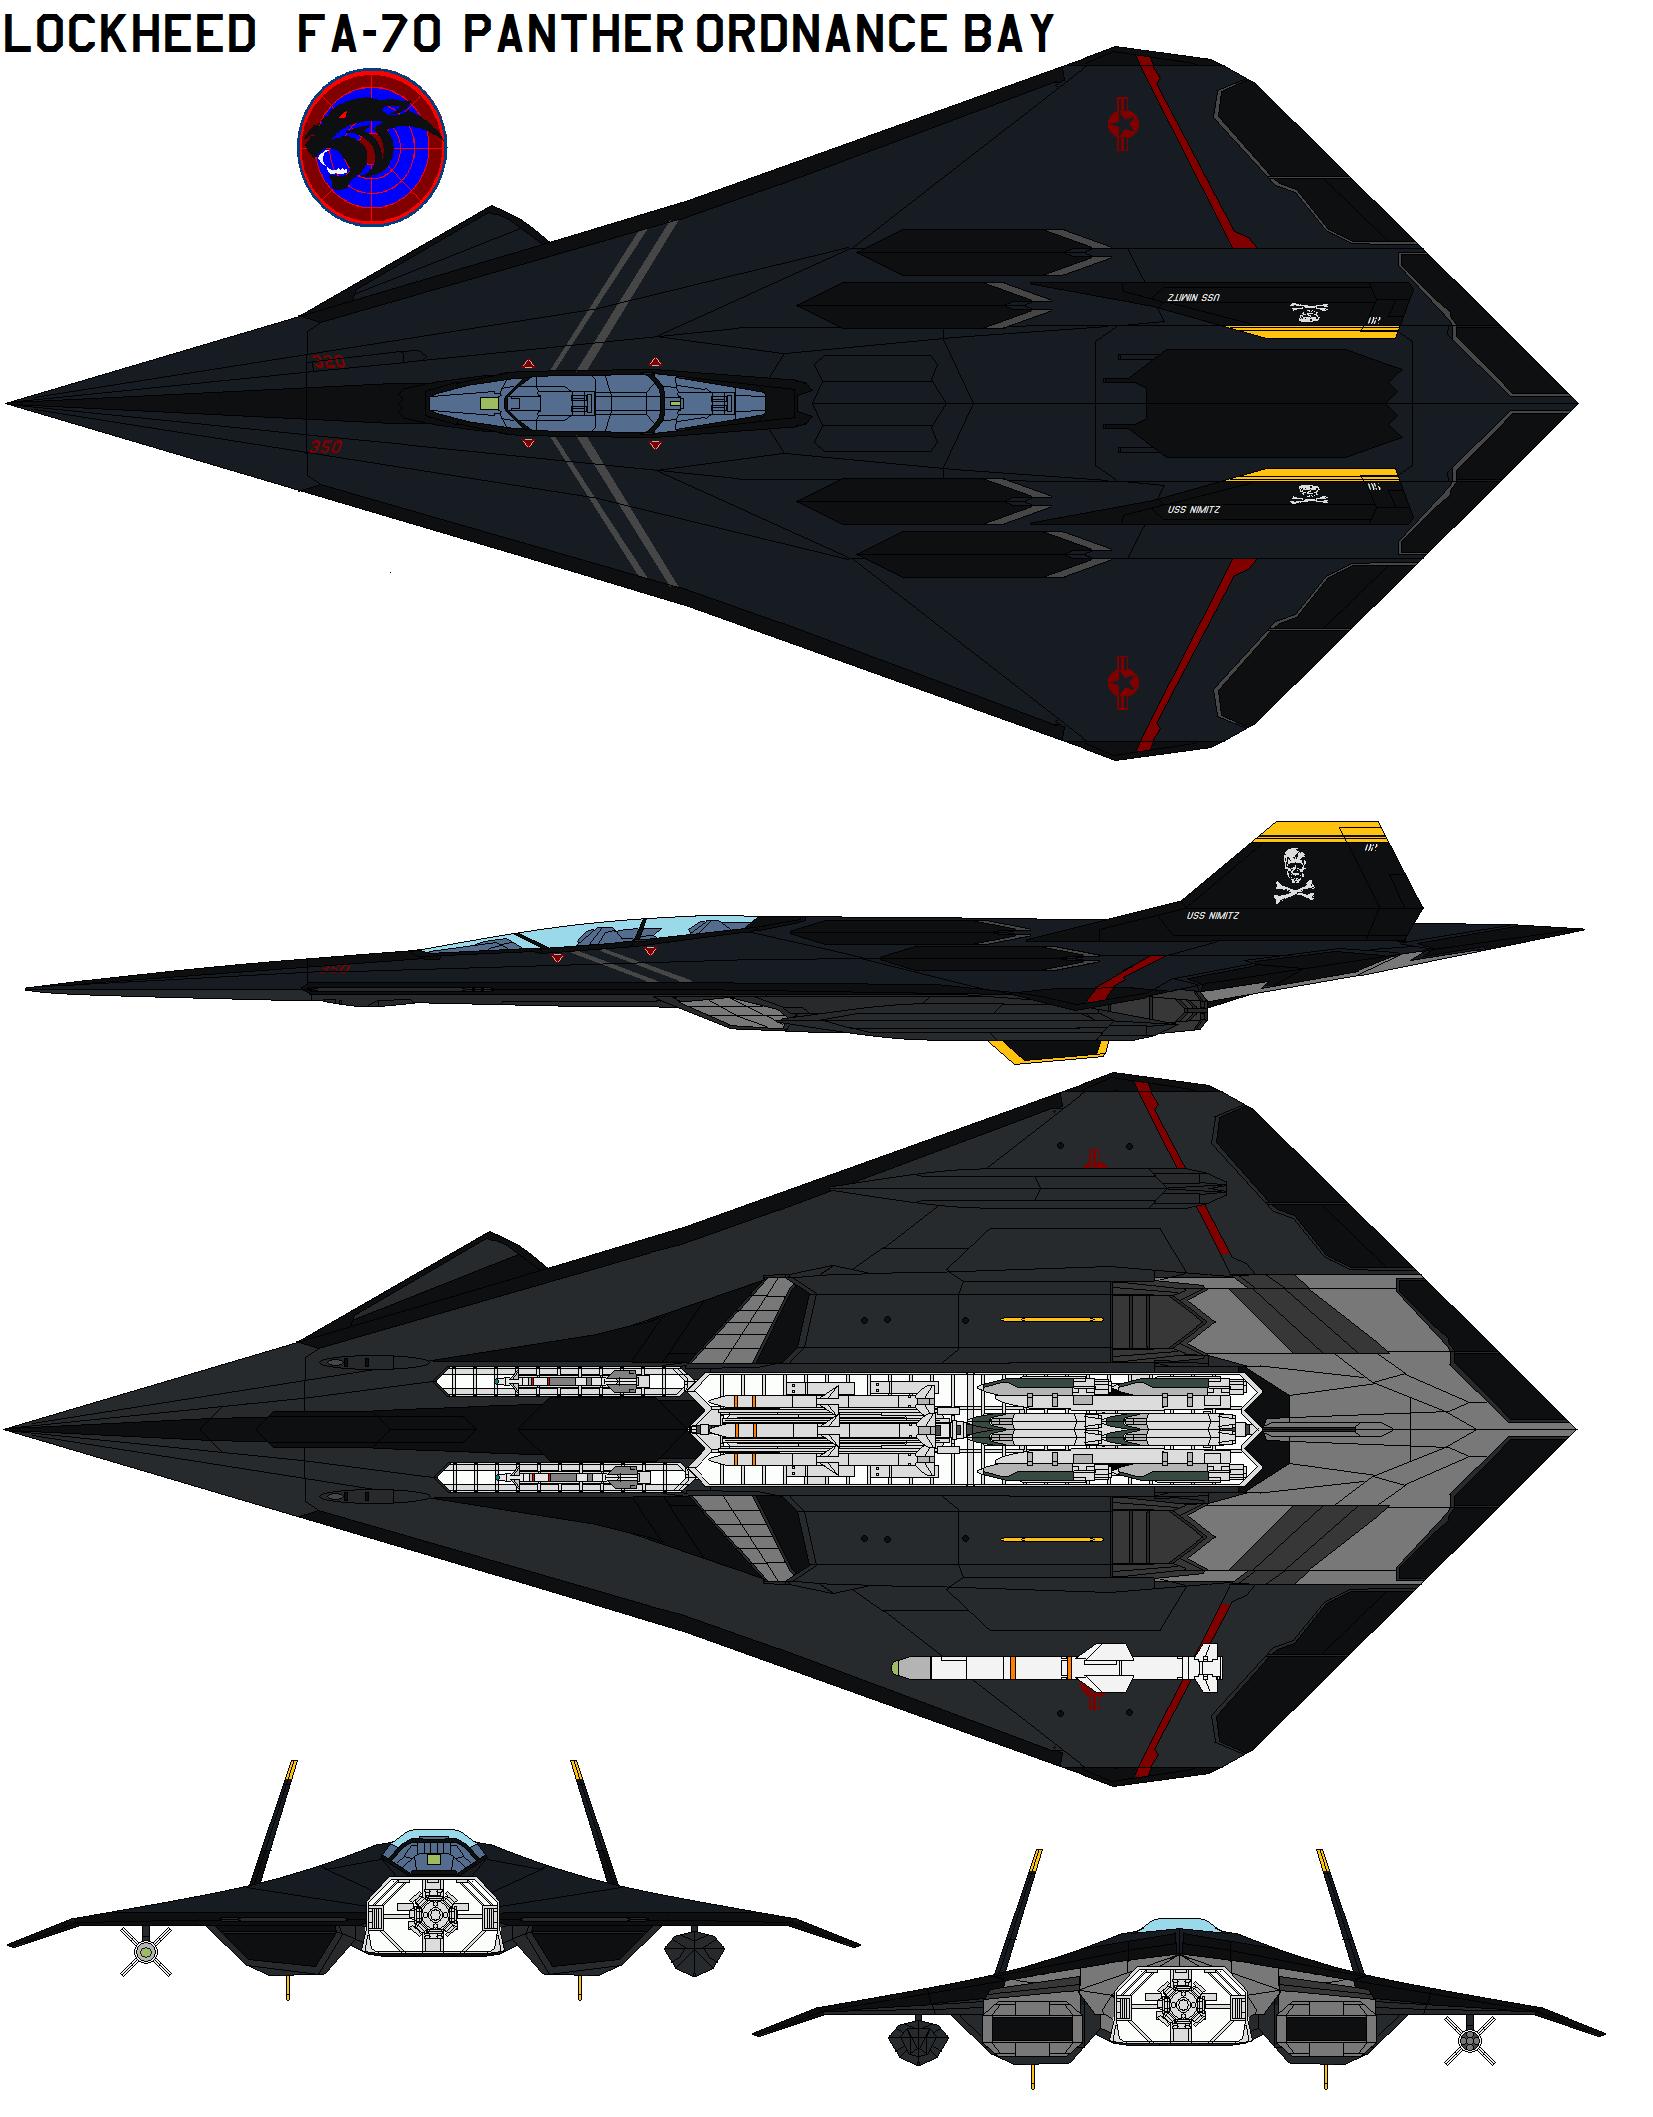 FA-70 ordnance bay loud by bagera3005